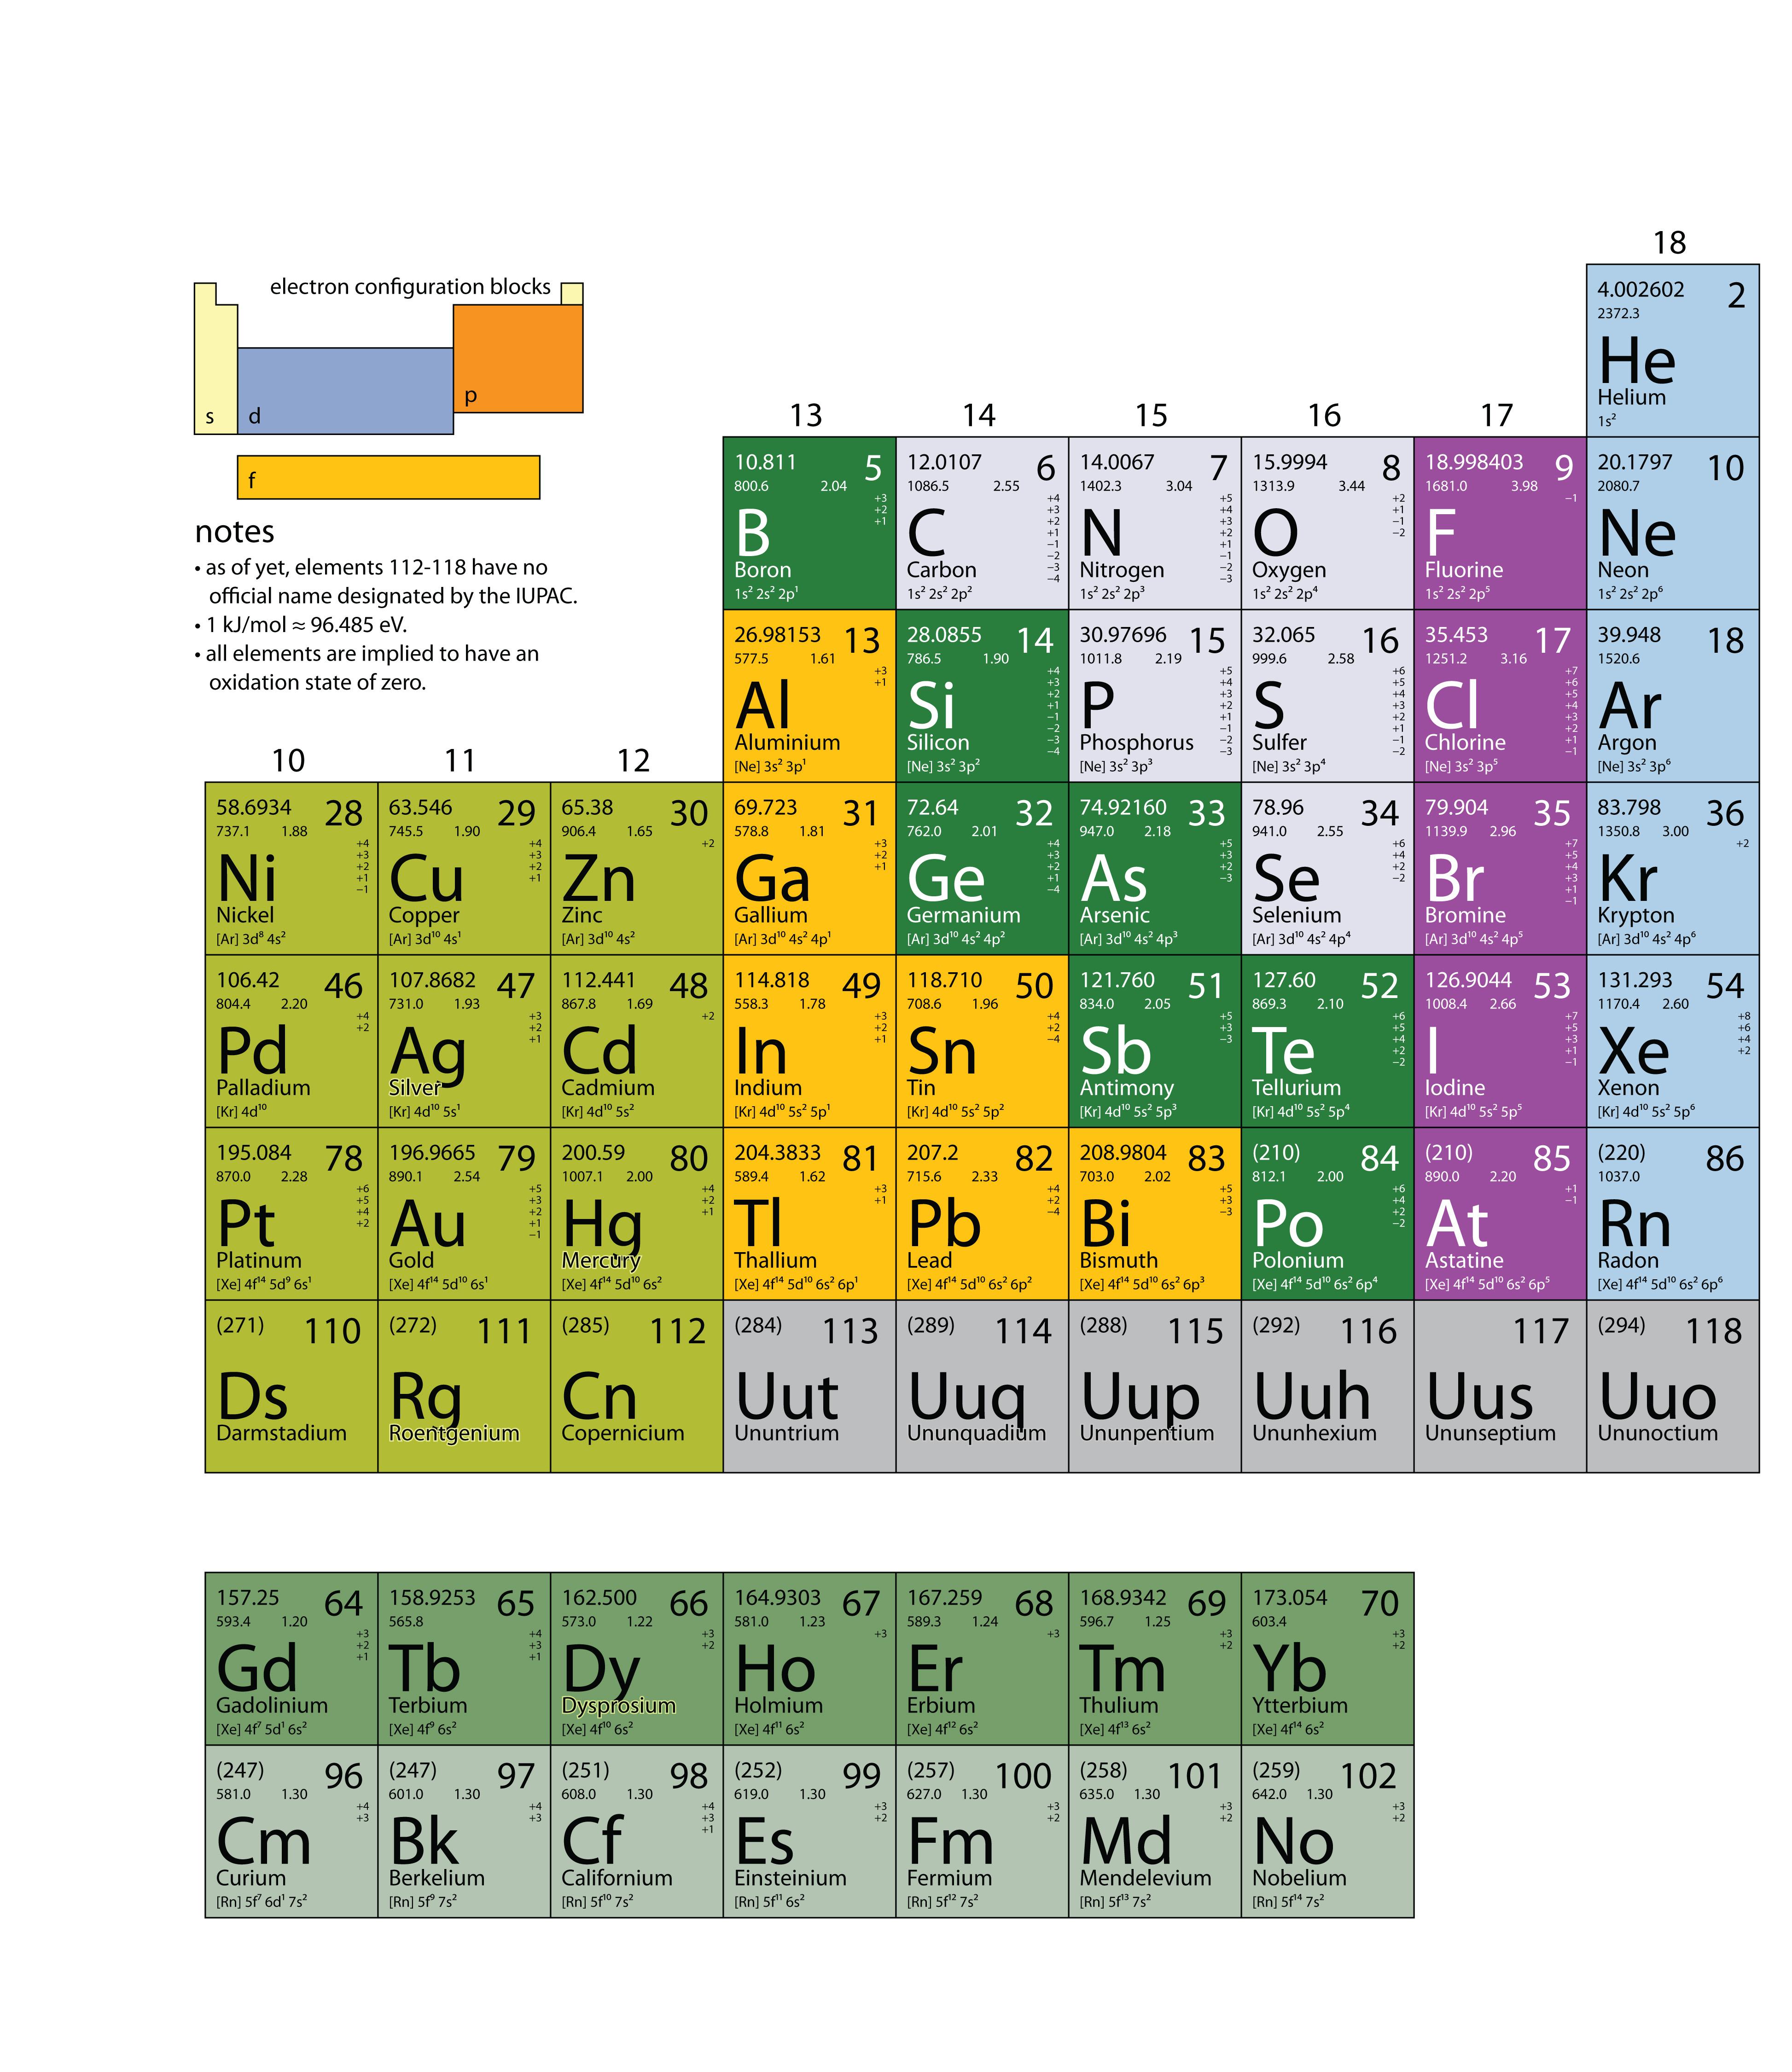 Neon symbol on periodic table nvsi introductory chemistry 10 flatworld neon symbol on periodic table gamestrikefo Images